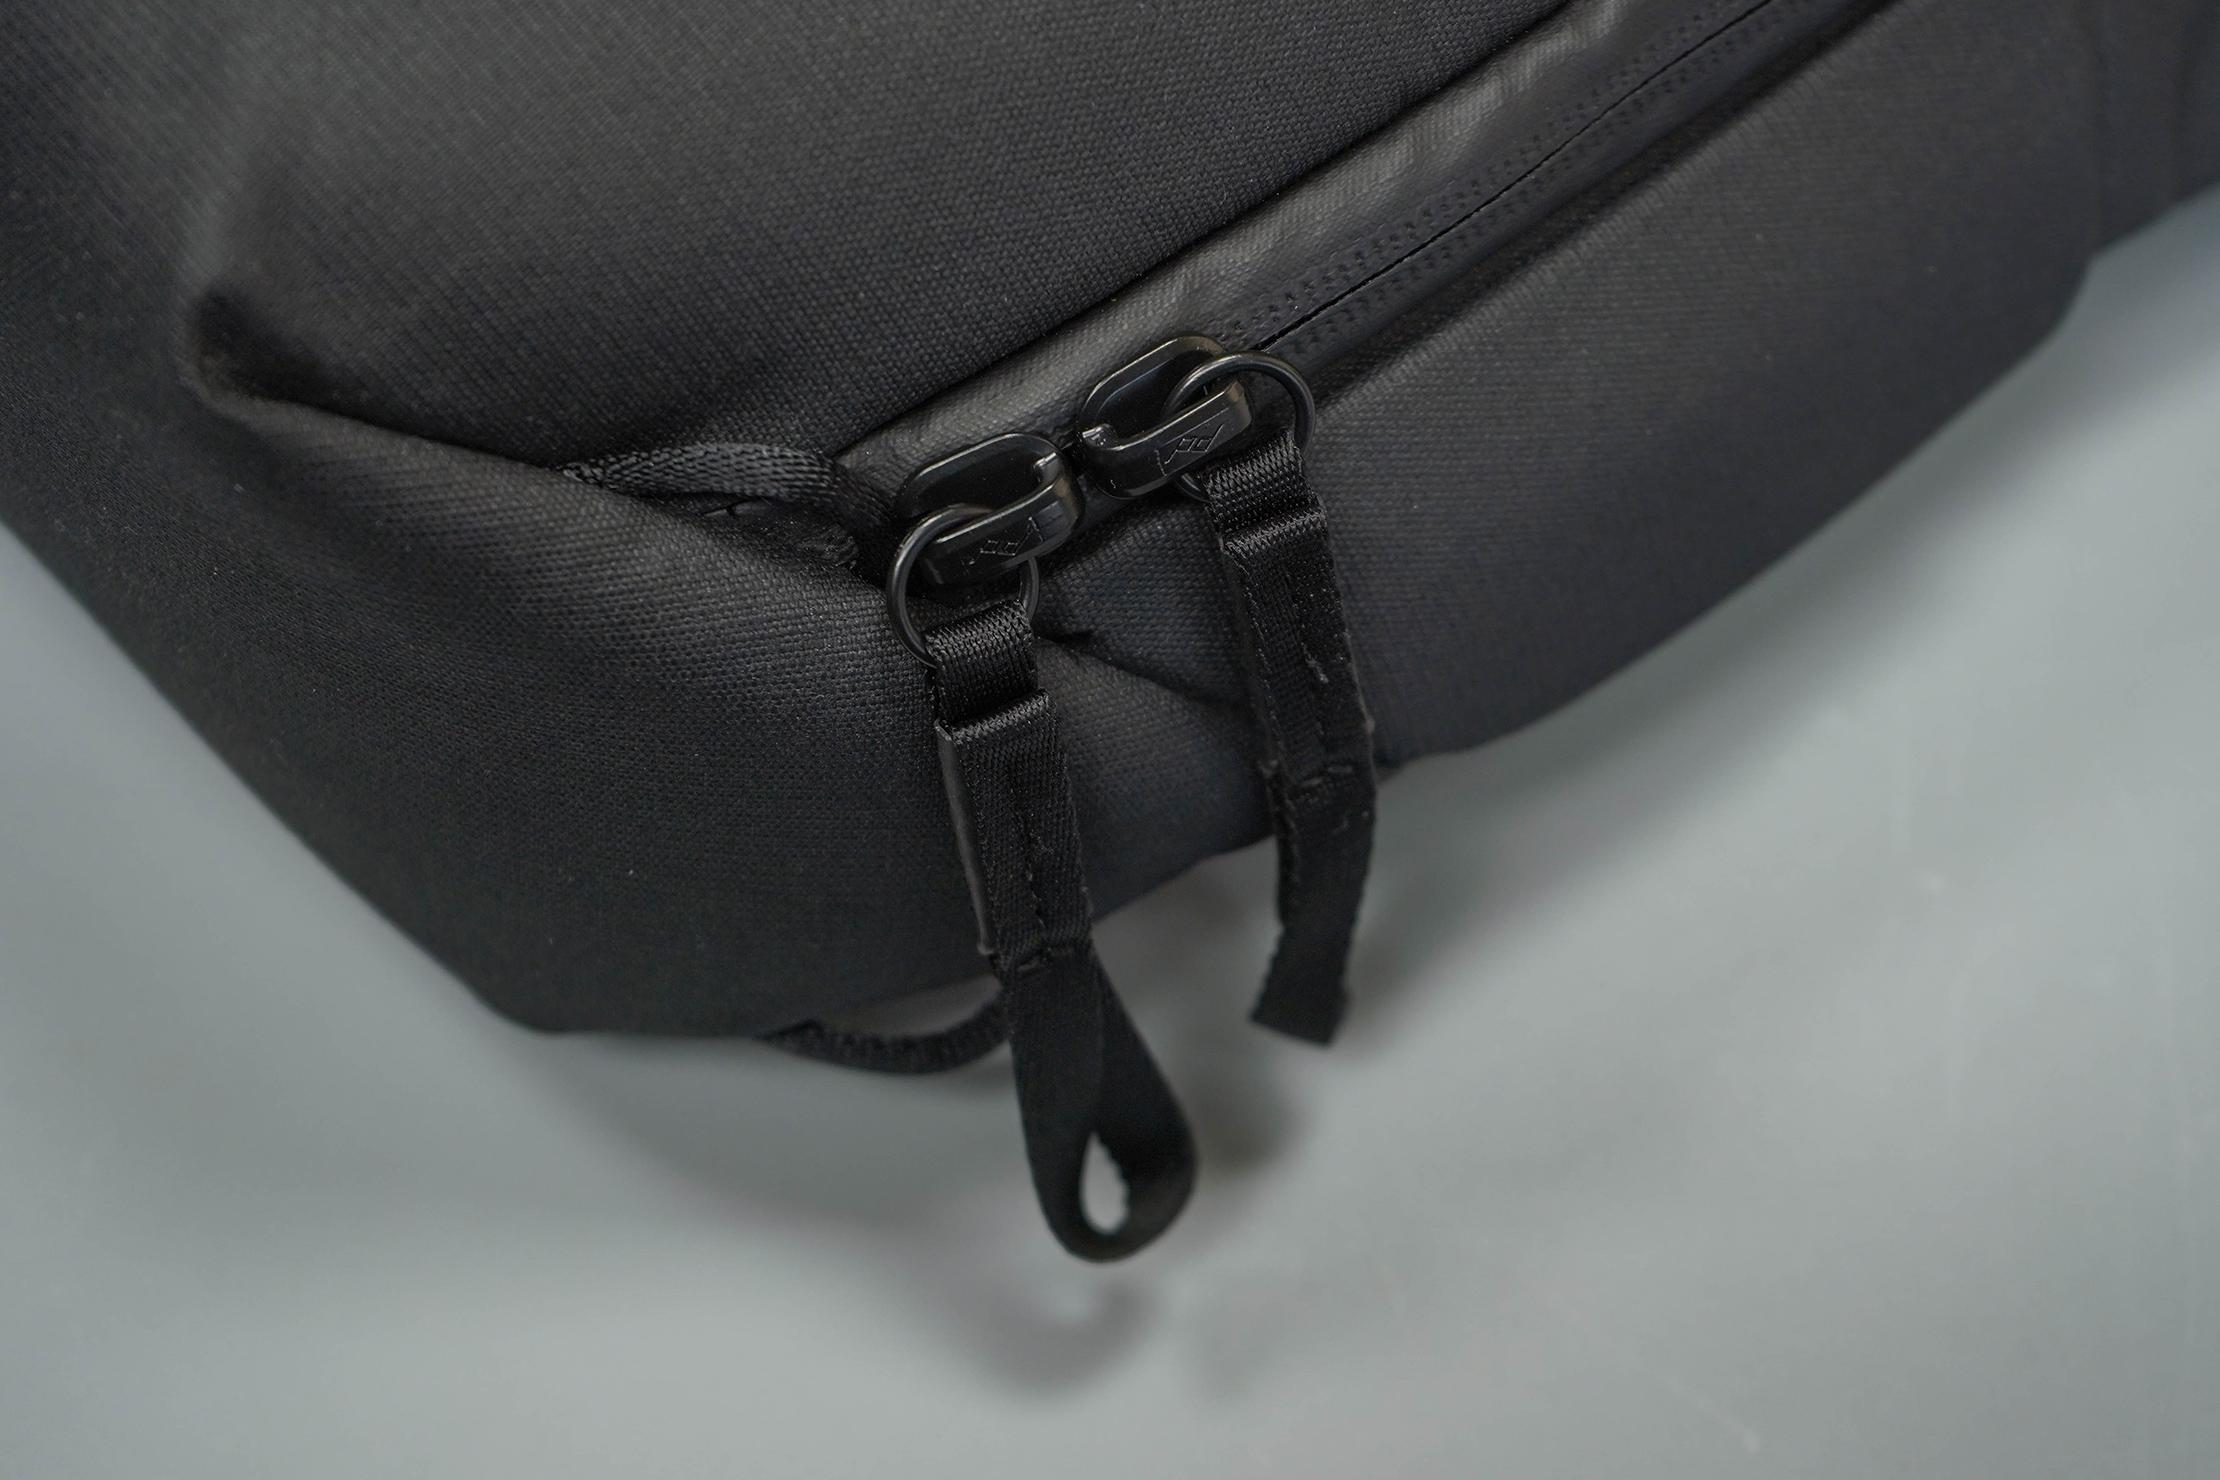 Peak Design Everyday Sling 6L V2 Zippers